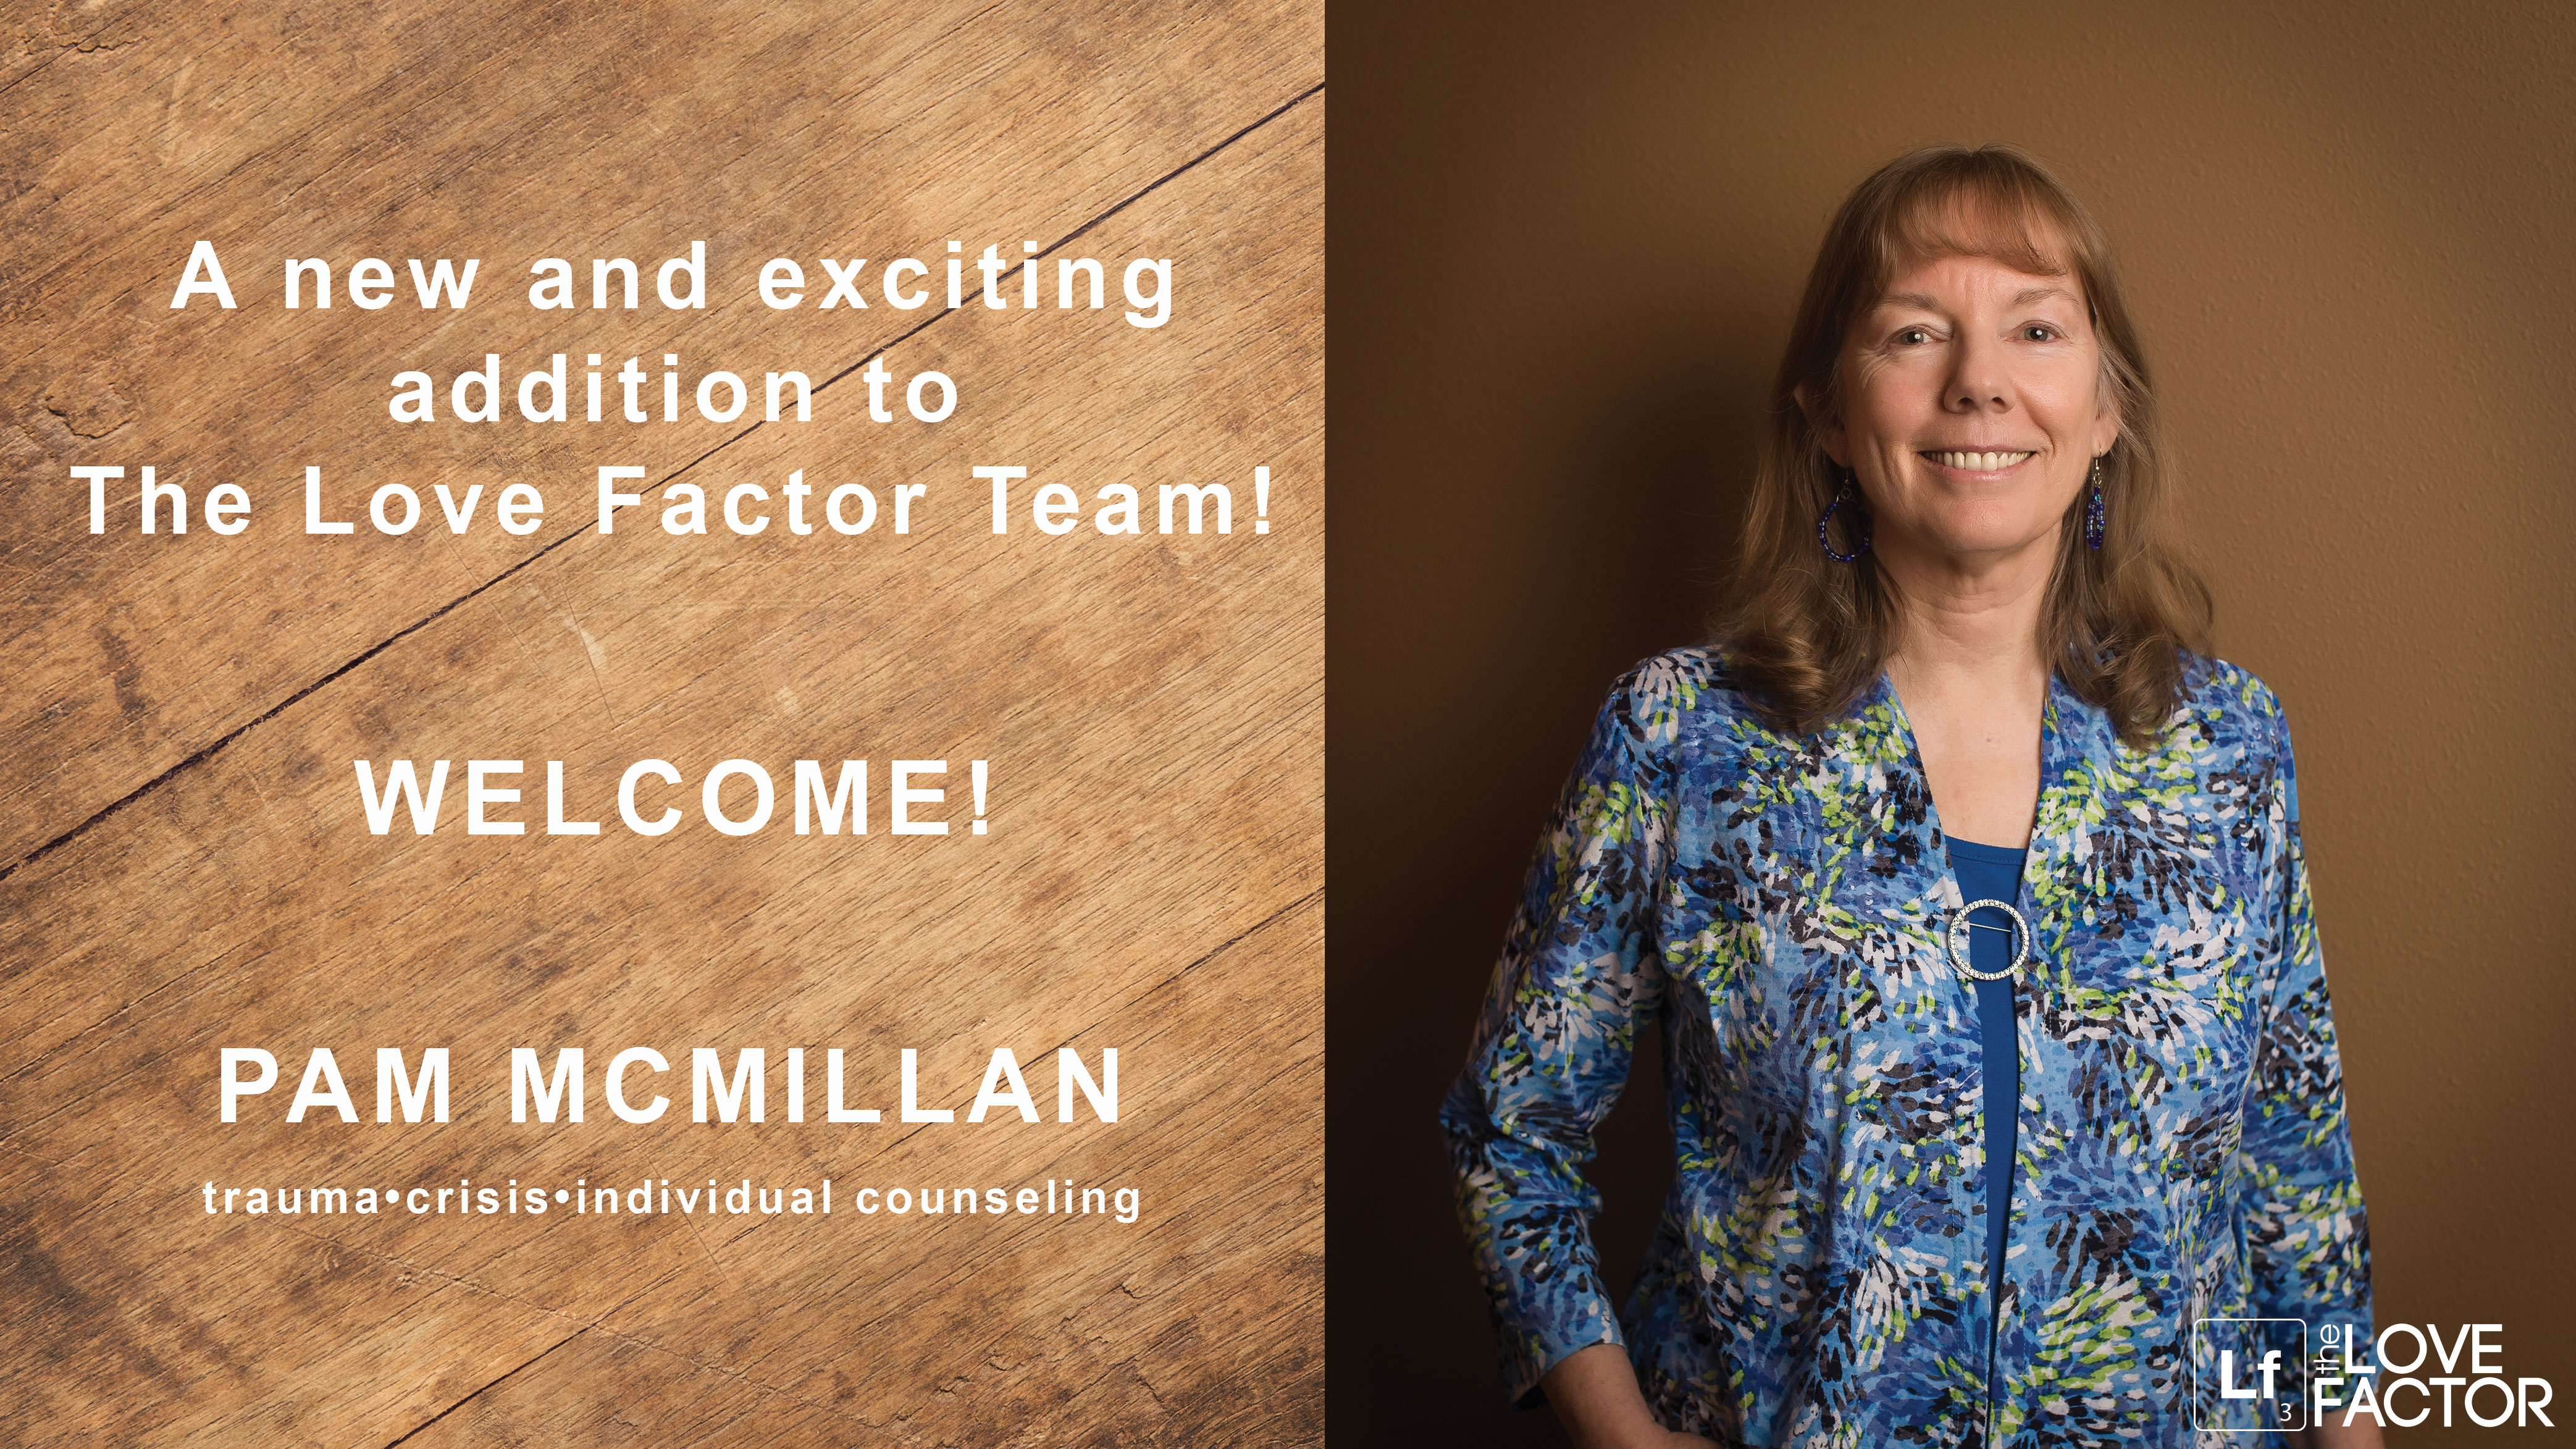 Pam McMillan